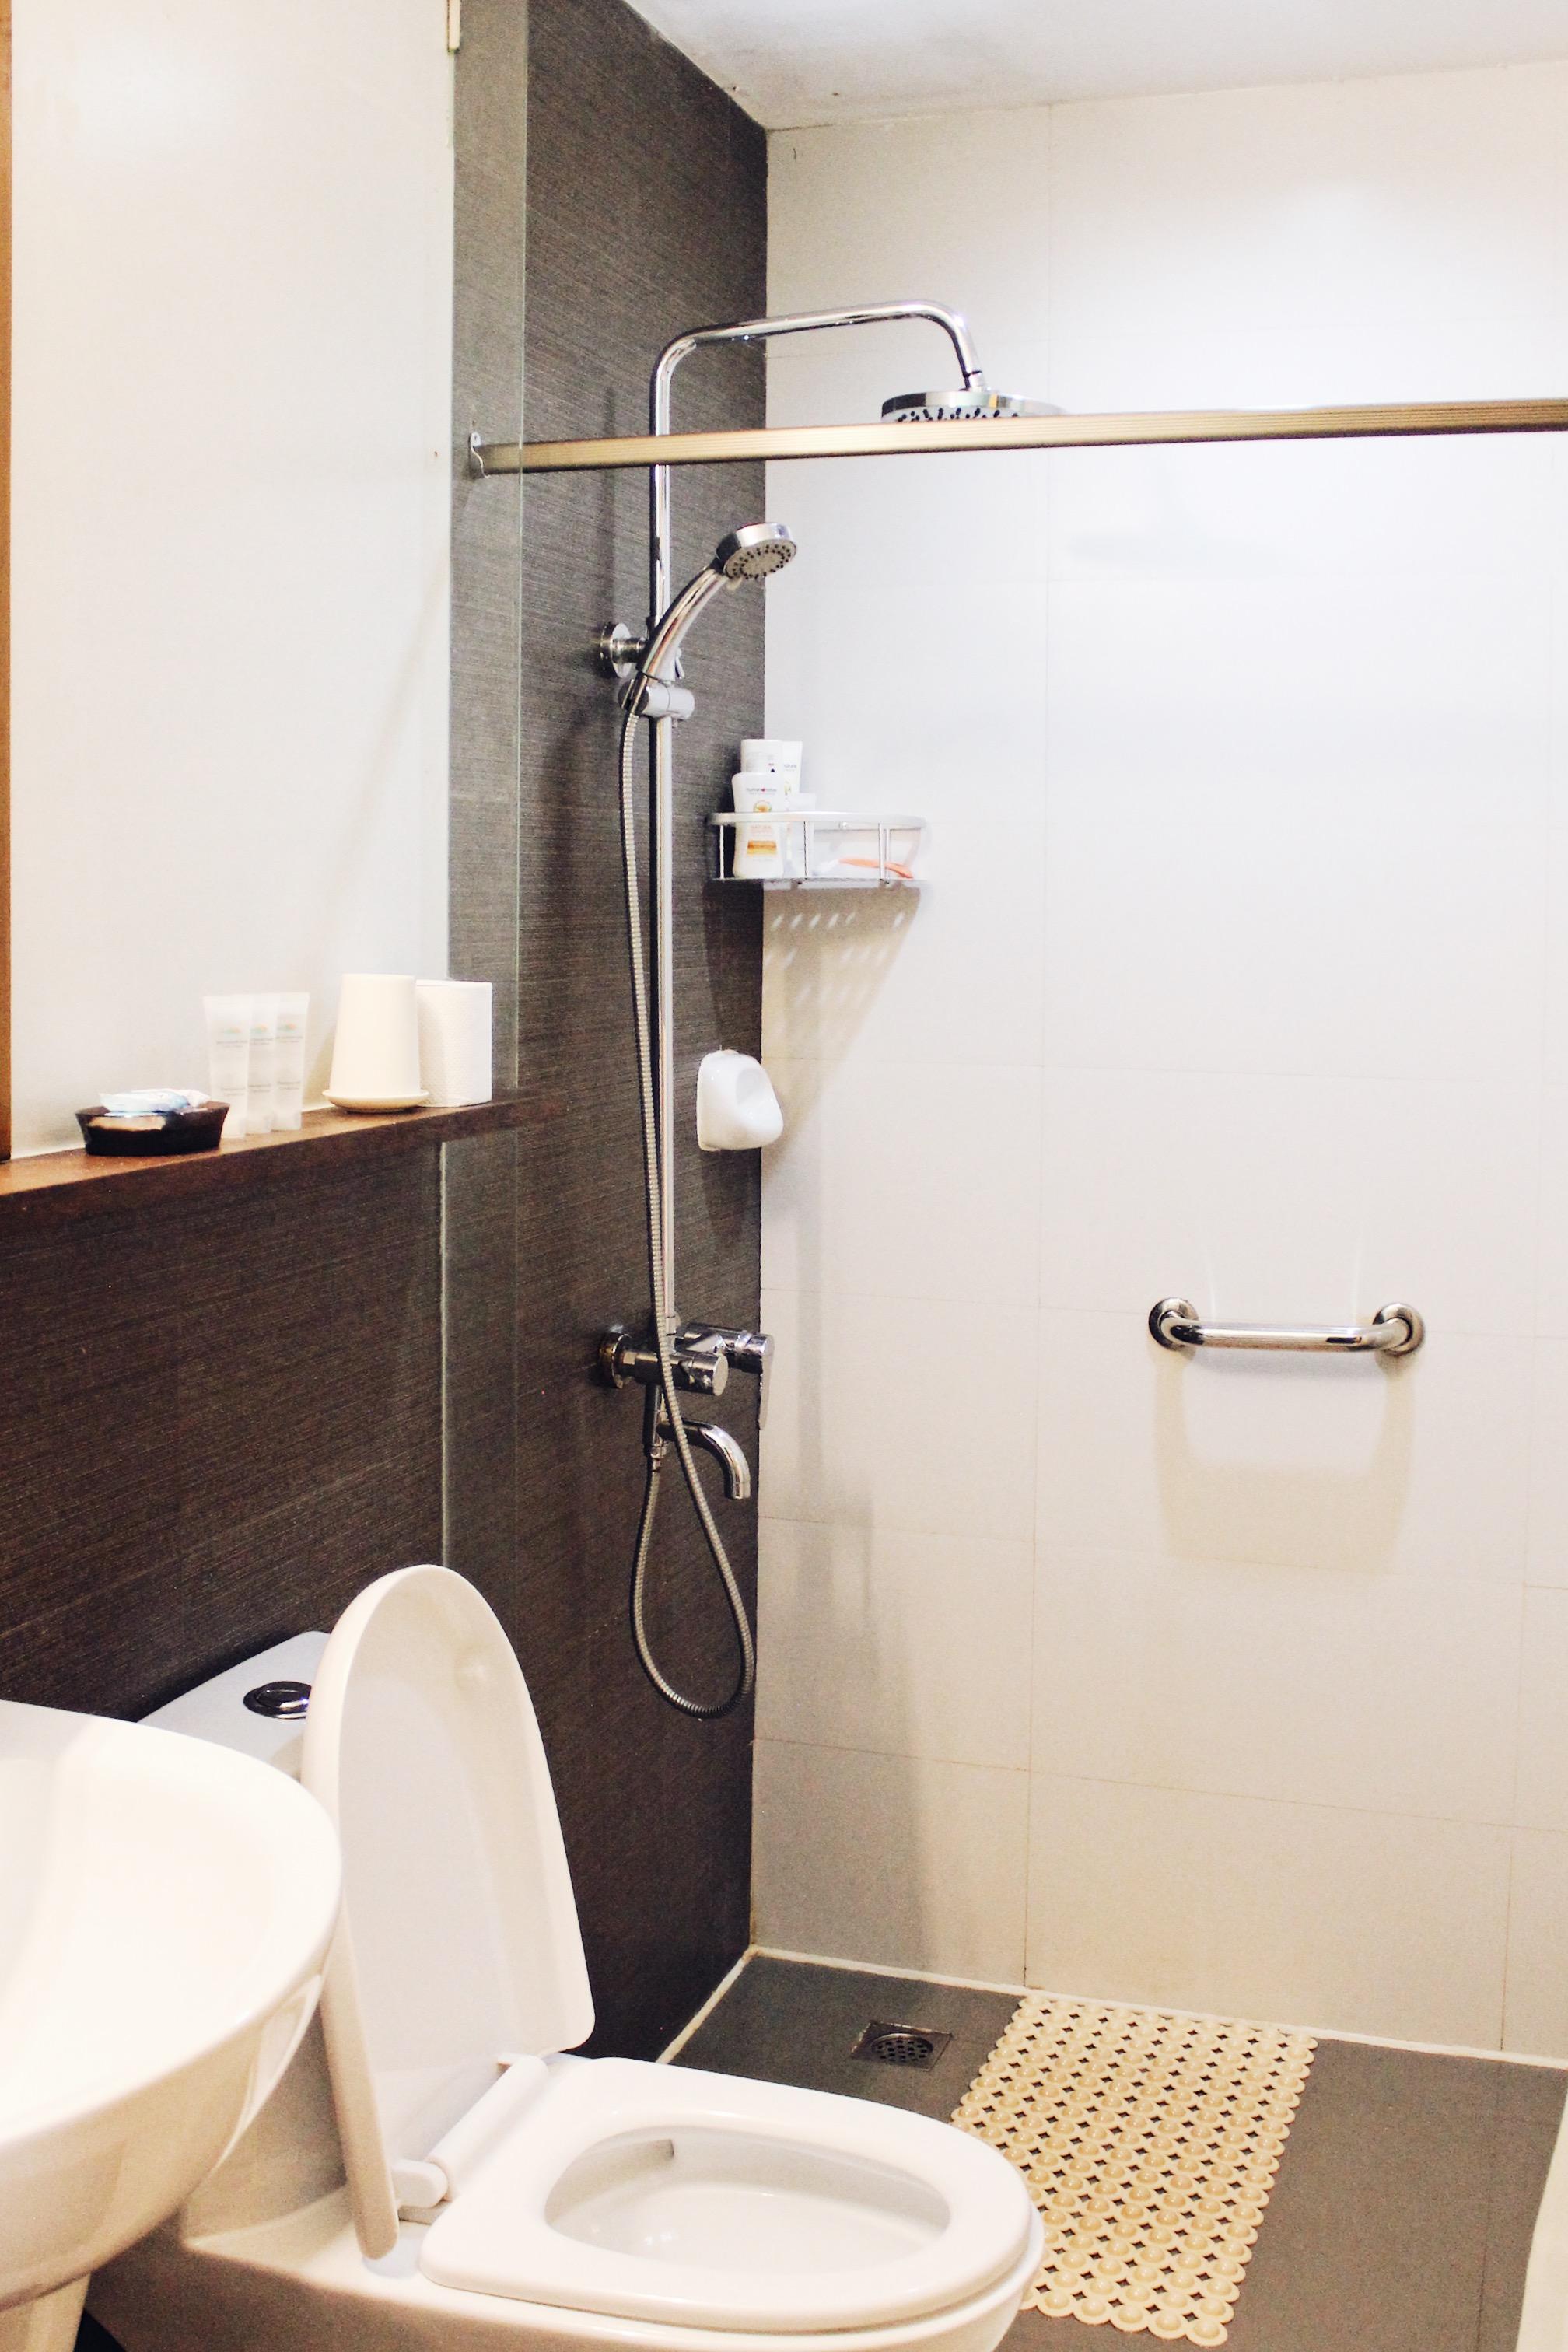 浴室-海茧酒店- El Nido,巴拉望岛-评论在illumelation.combeplay3体育官方下载